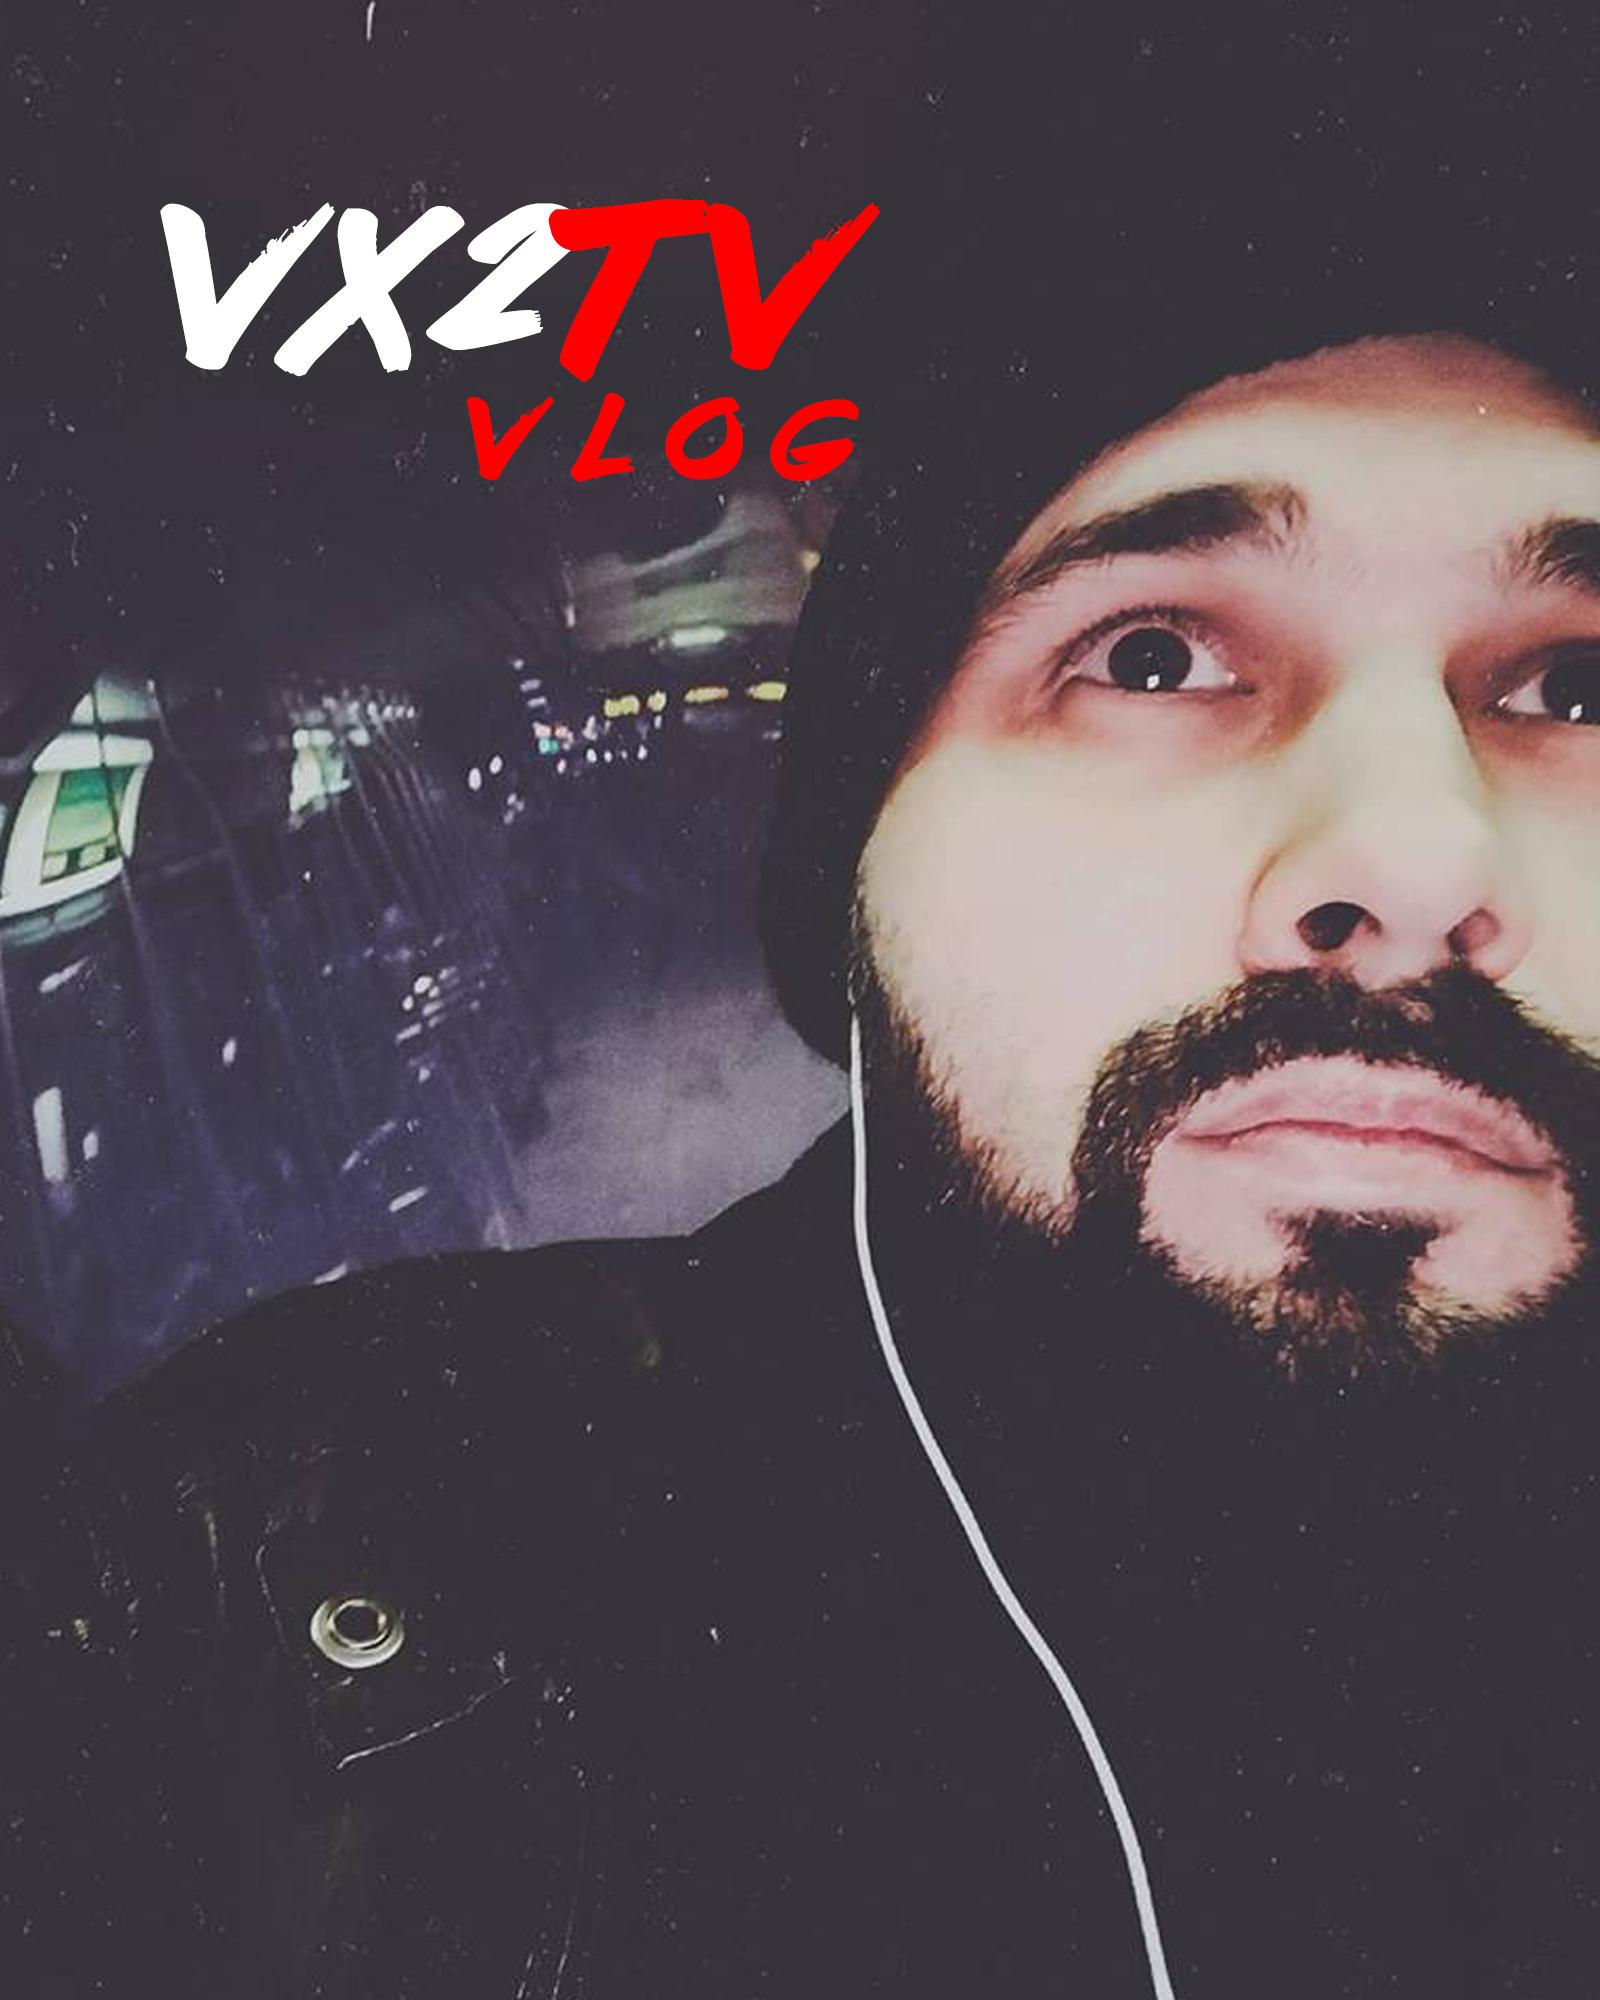 VX2TV Vlog - Vasko Obscura.jpg